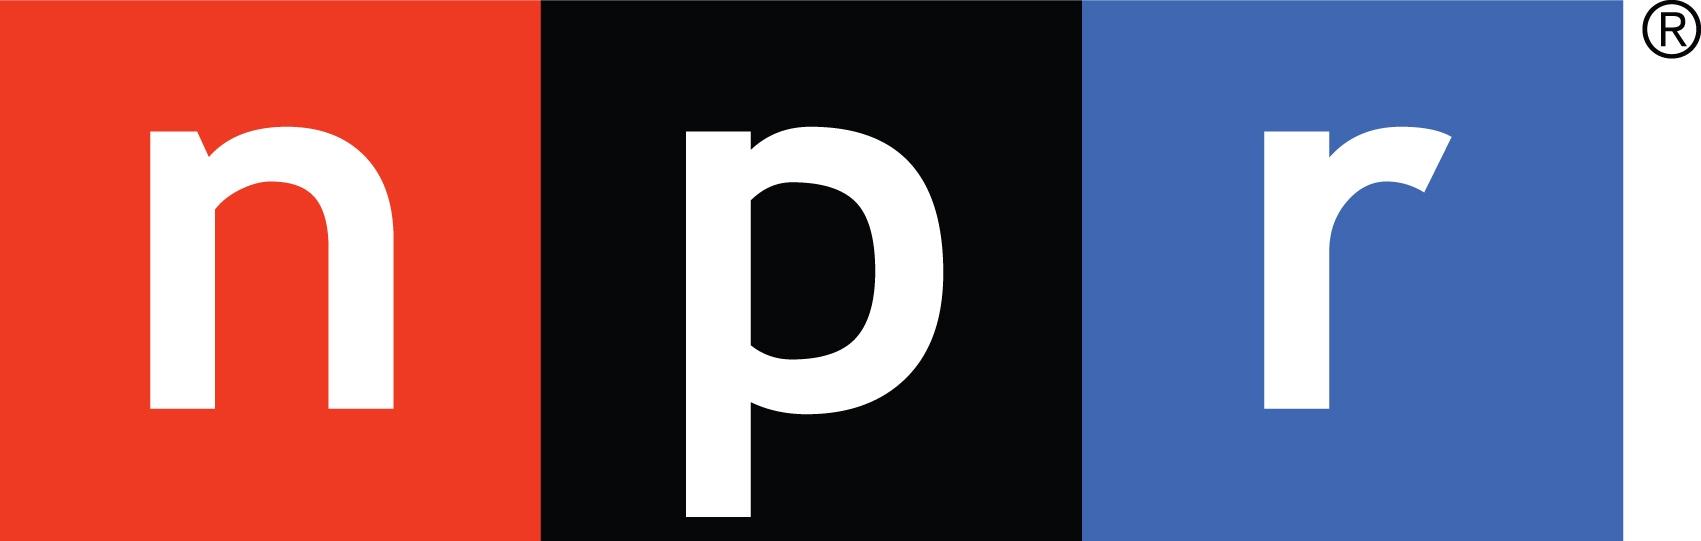 article_npr_logo_1-300x99.jpg